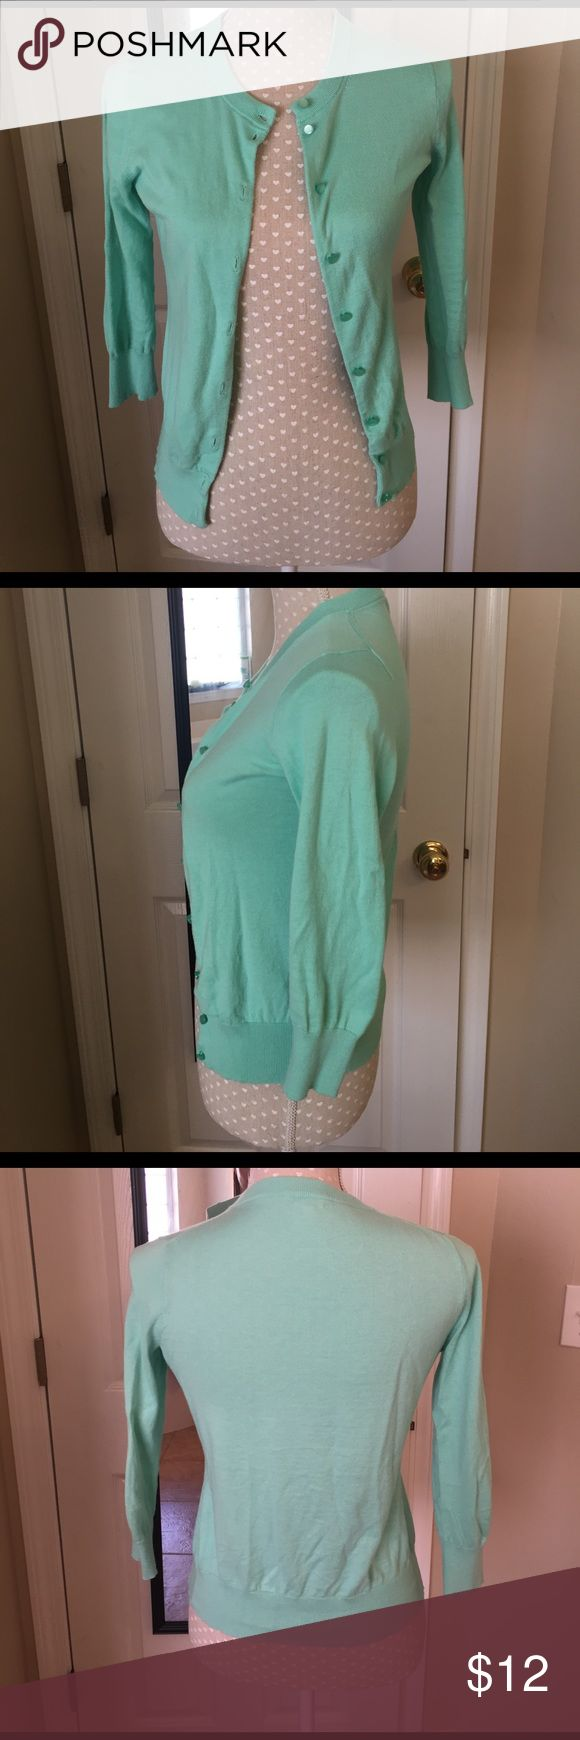 J.Crew Factory Mint Cardigan EUC Size XS 3/4 Sleeve J.Crew Factory Sweaters Cardigans